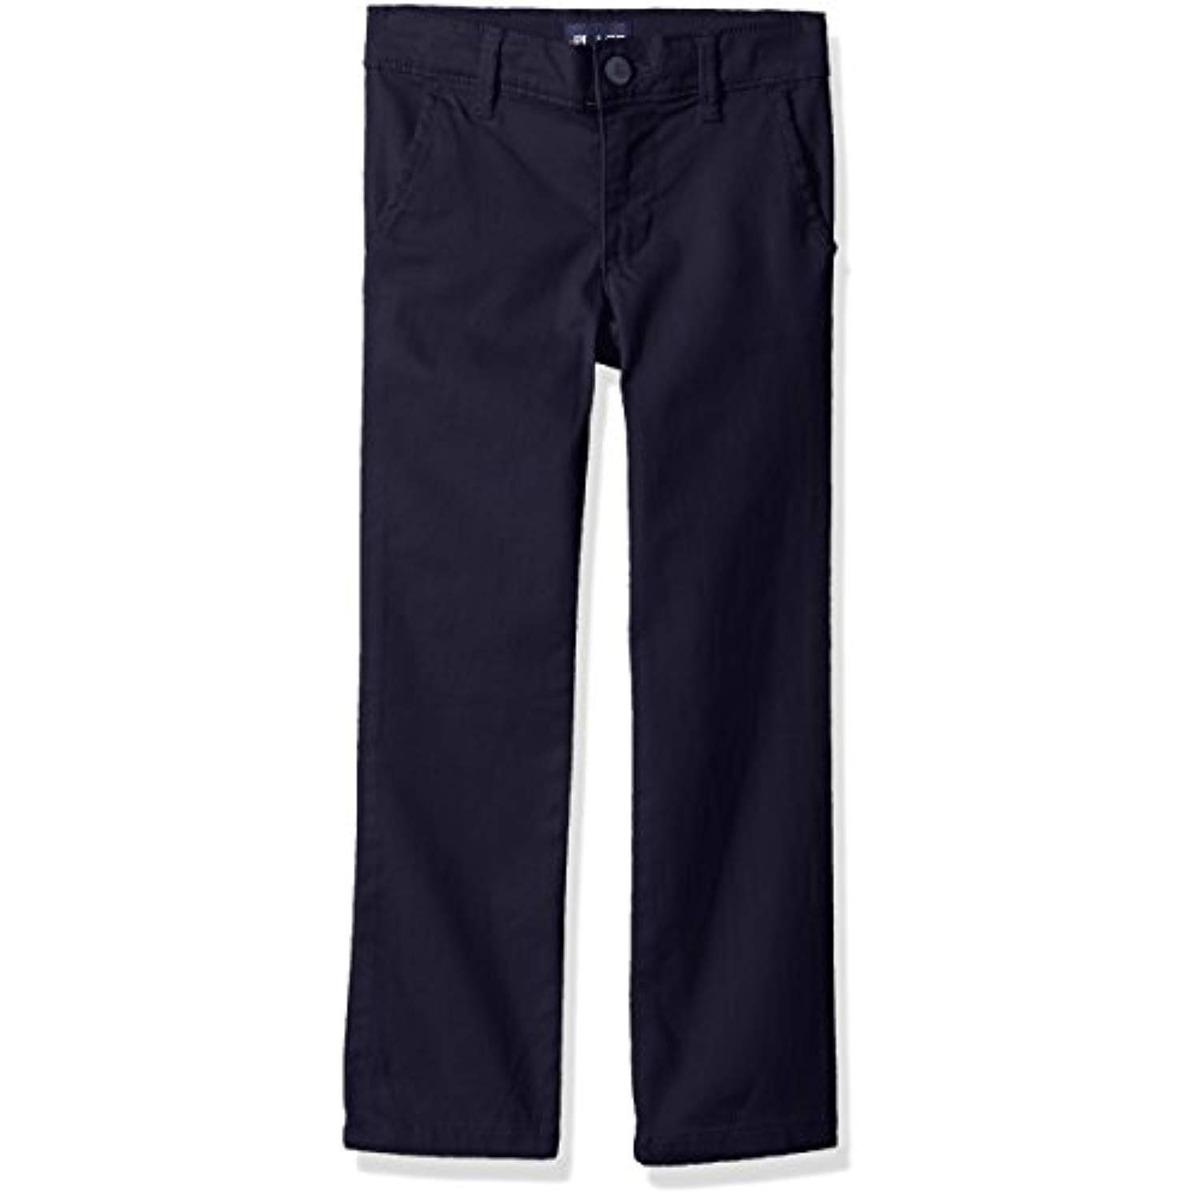 Niñas Pantalones Jeans Para Uniformes Los VGqMzpUS